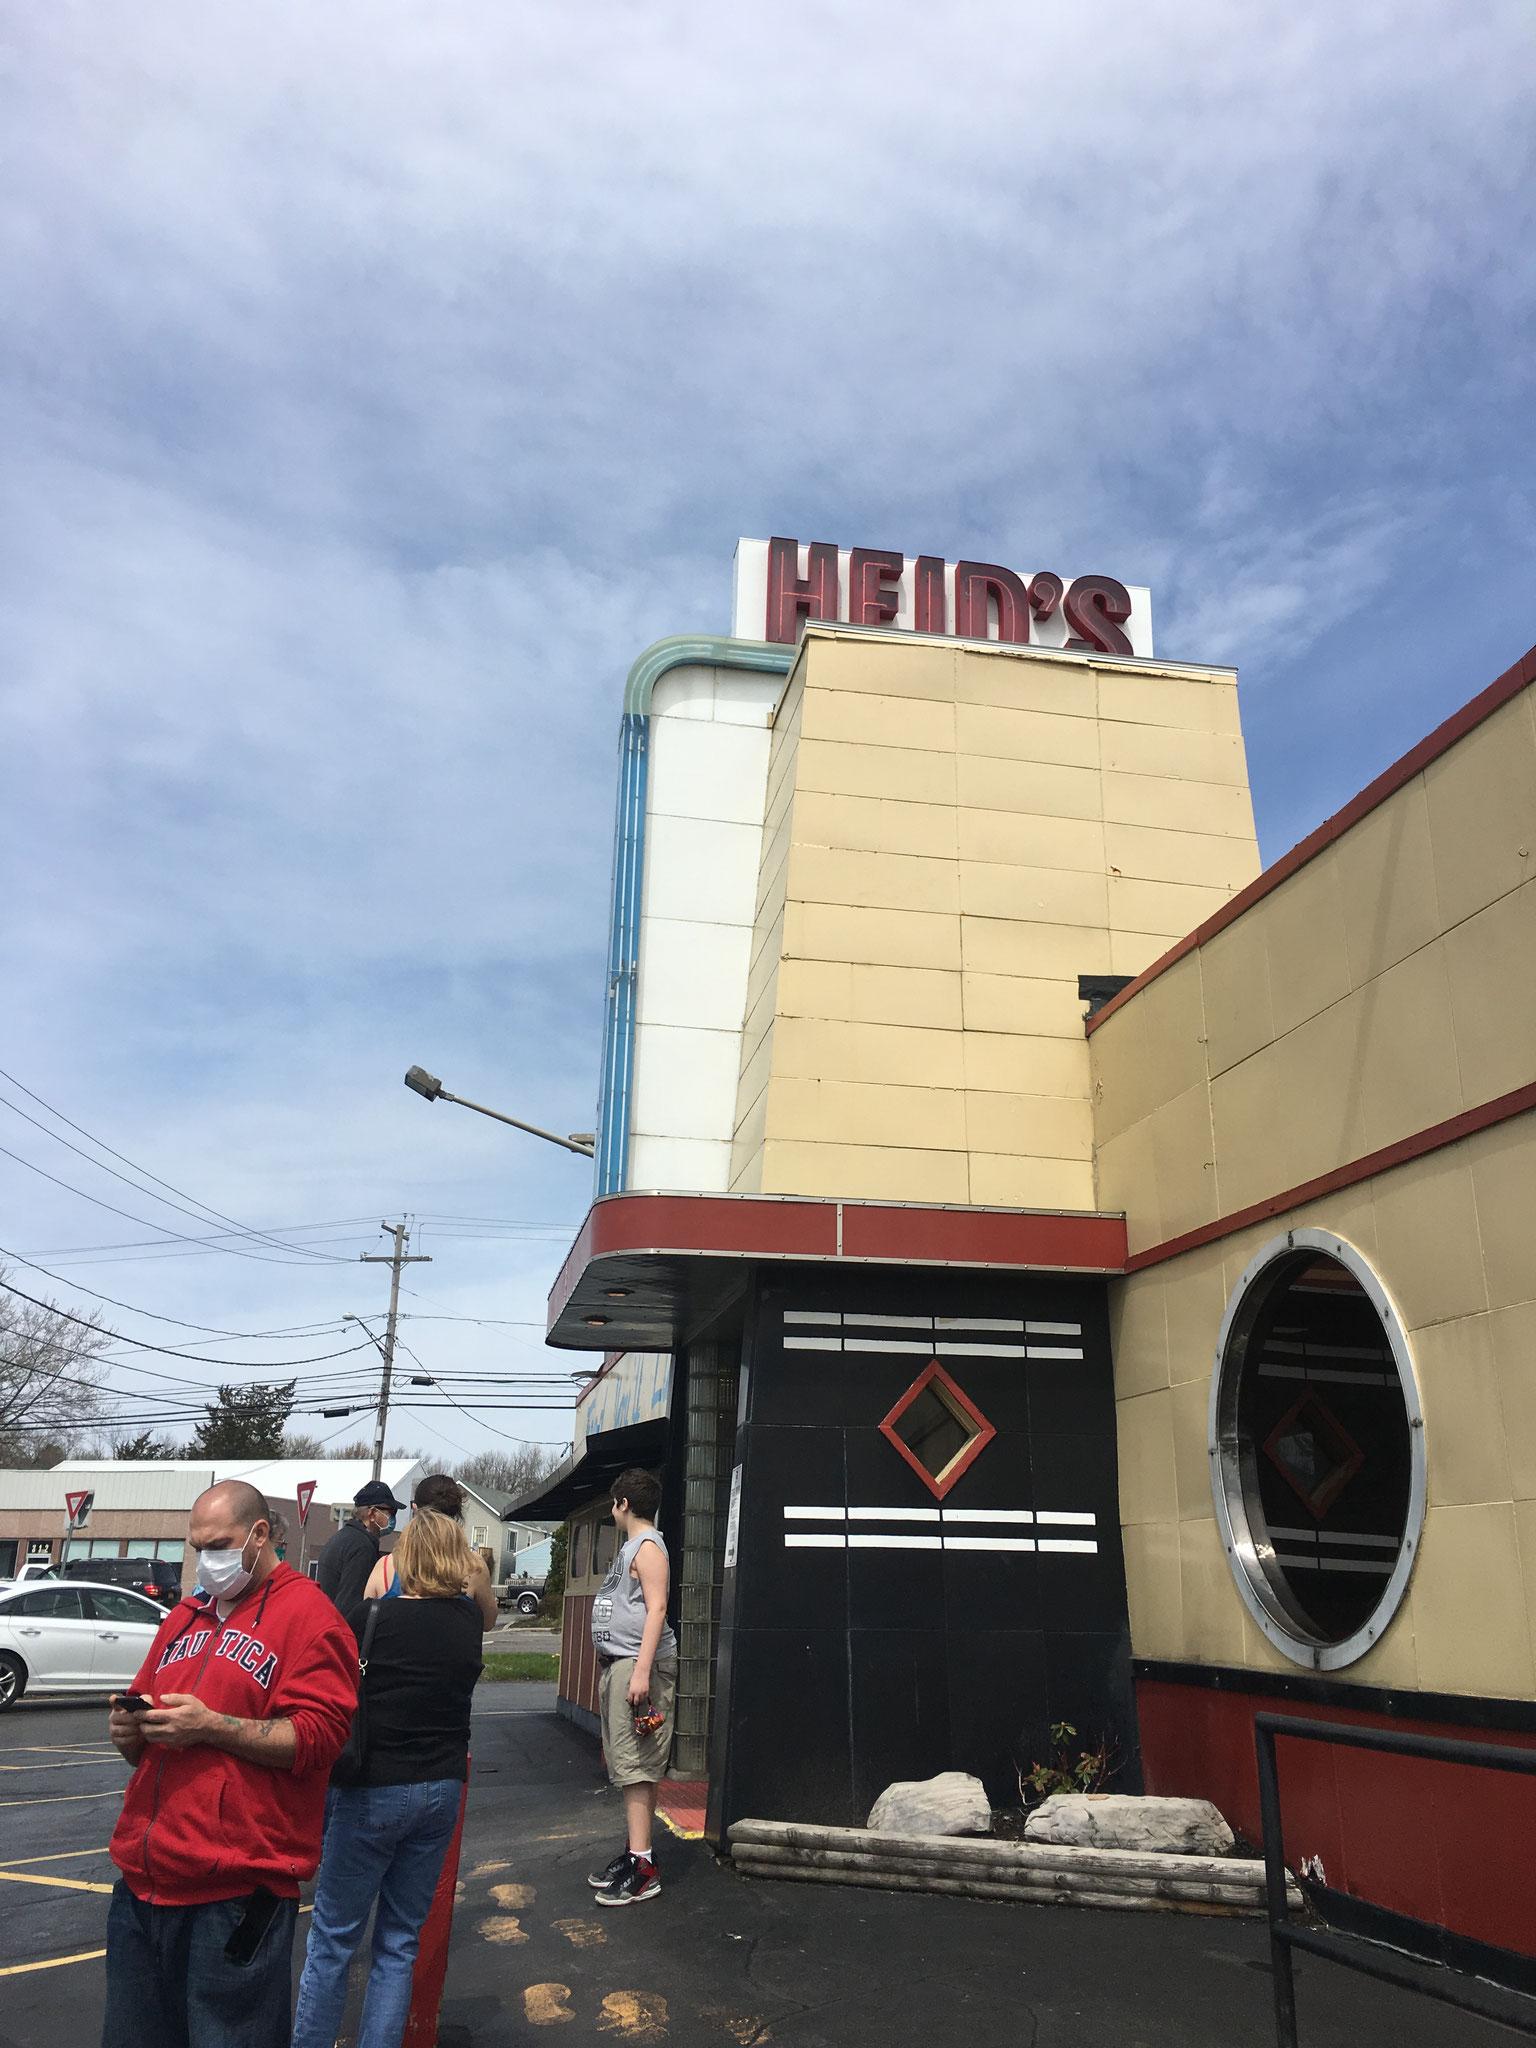 Heid's, a famous Syracuse lankmark eatery, May, 2020